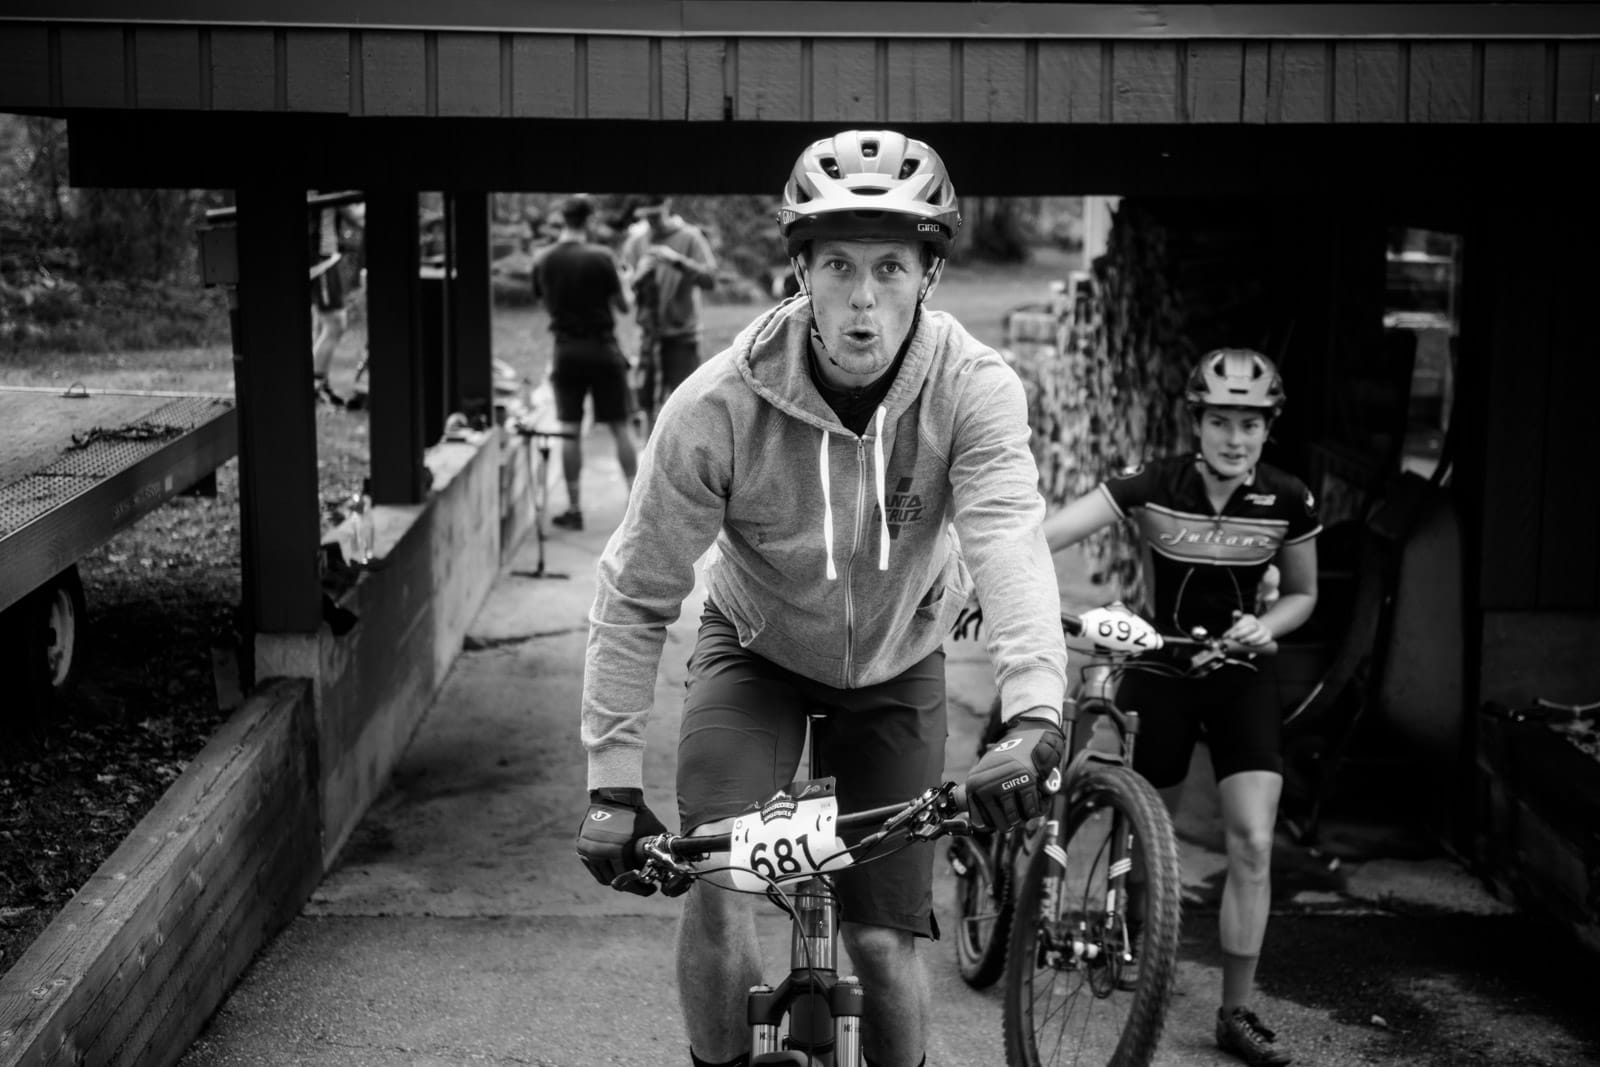 Santa Cruz Bicycles - Chris Johnston and Campbell Steers at Singletrack6